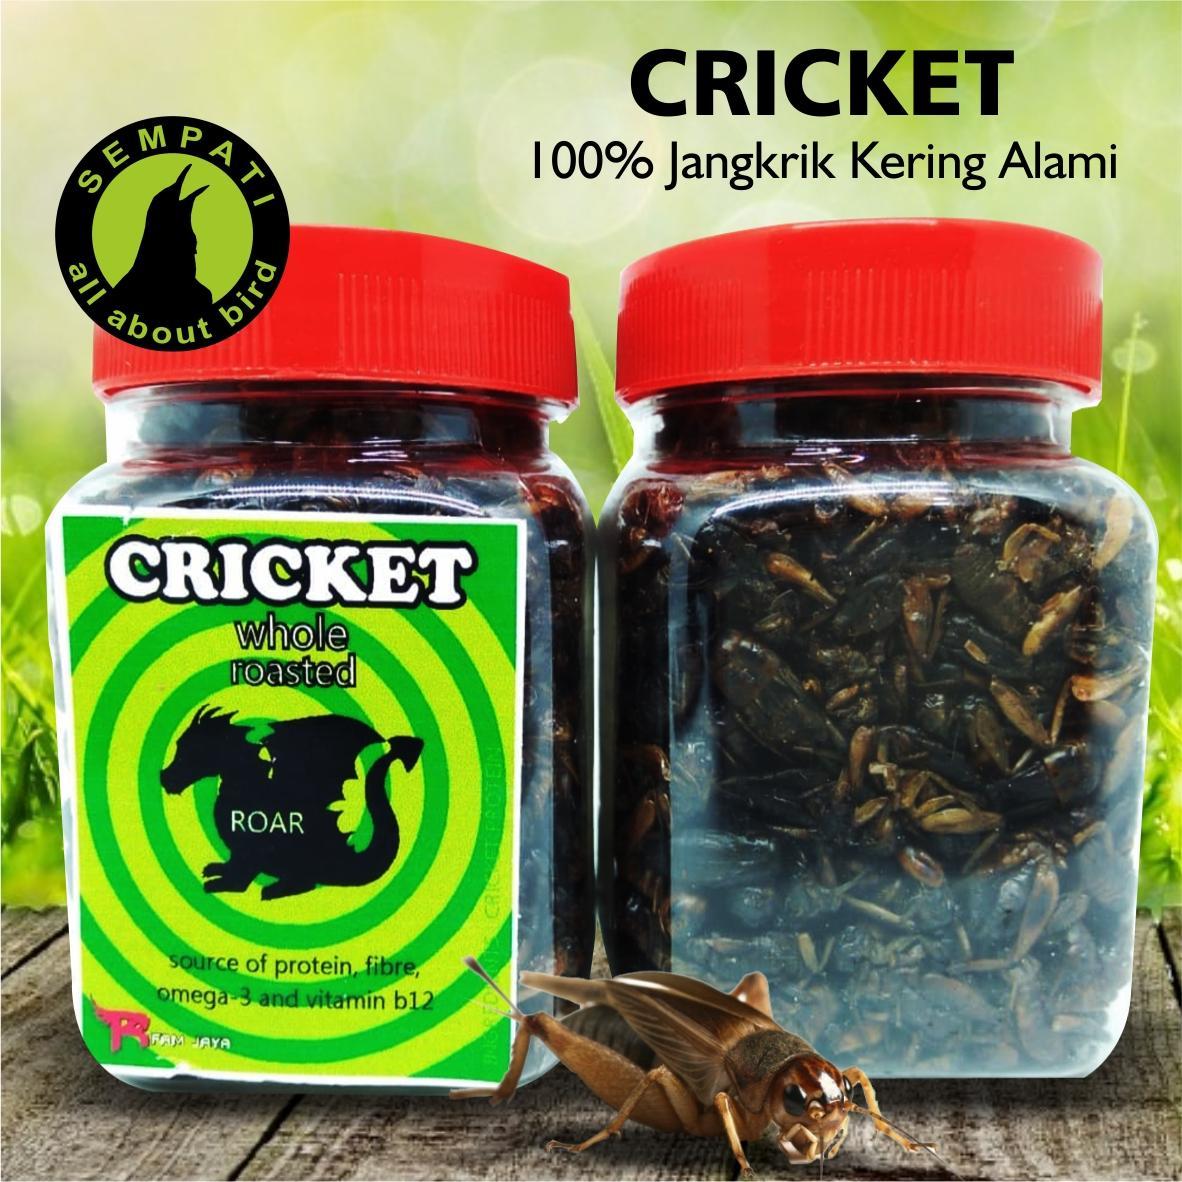 Cricket Jangkrik Kering Kemasan Toples R-Fam Jaya Pakan Burung Anis Pleci Kacer Jalak Murai CRICKETR